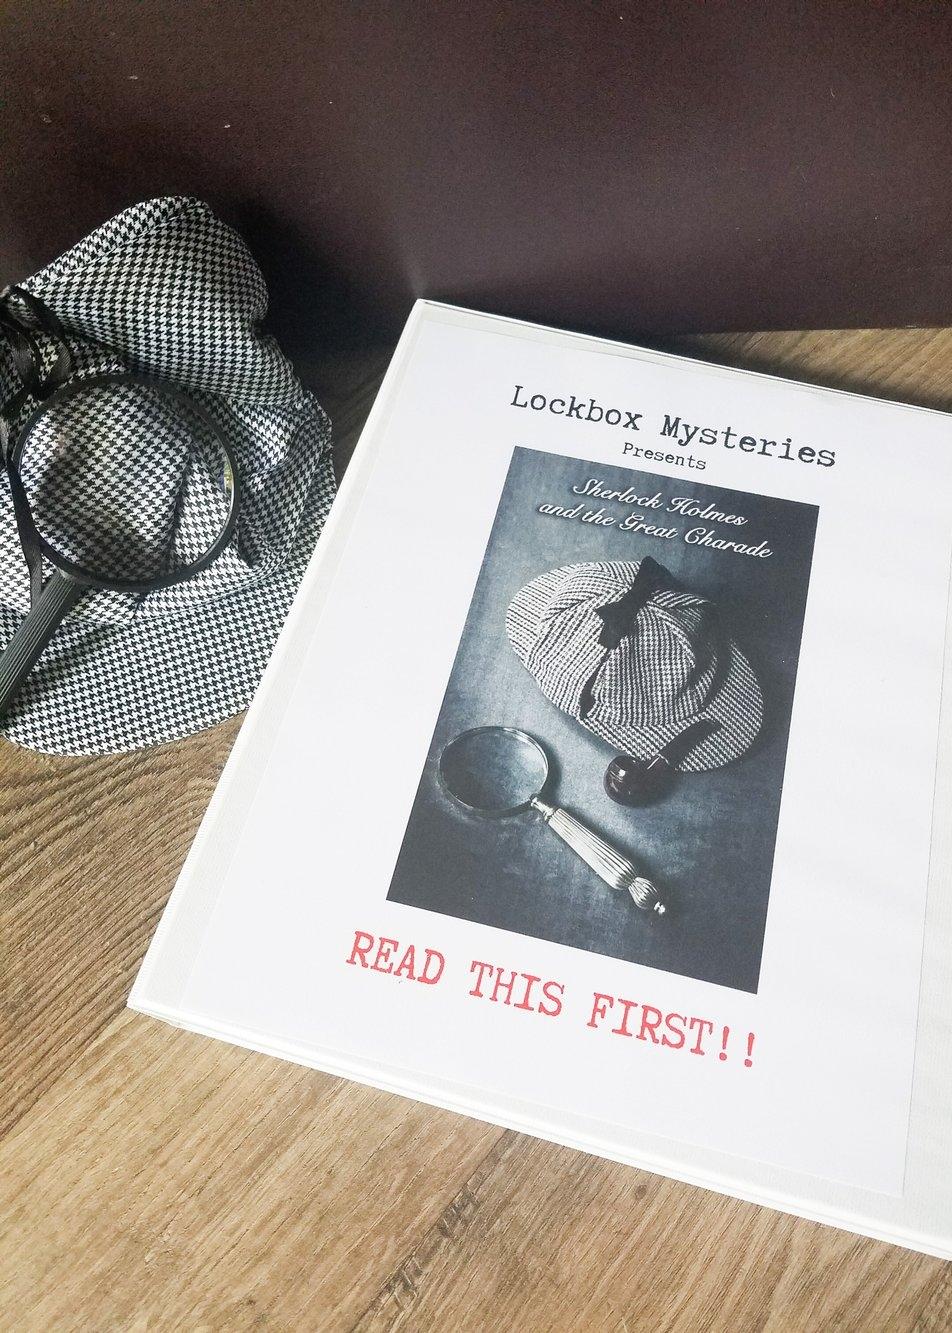 Lockbox Mysteries